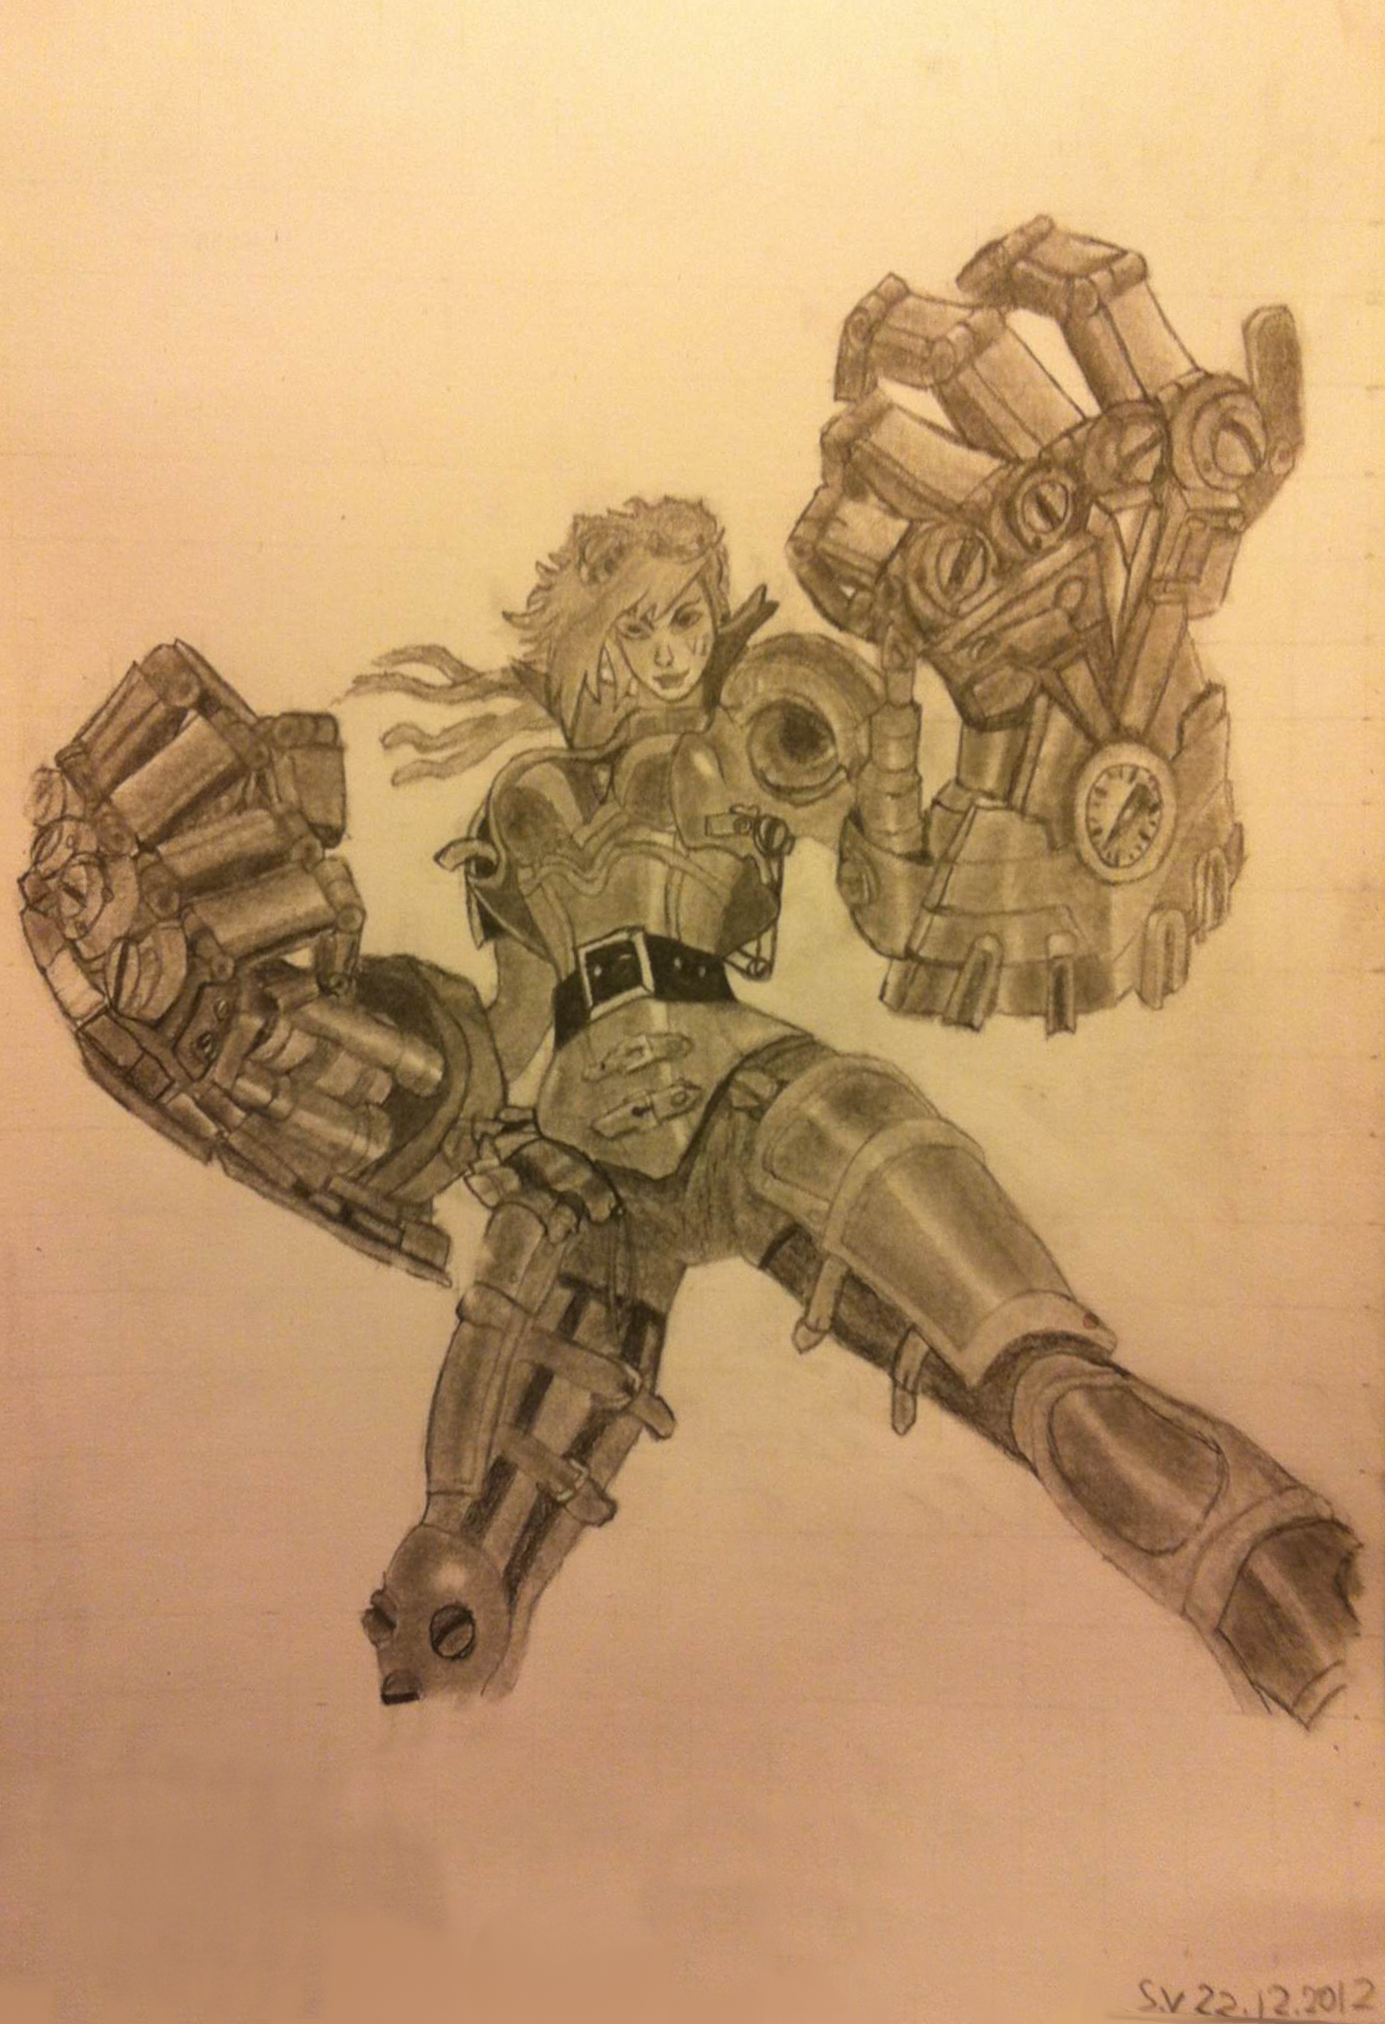 Vi the piltover enforcer by Sarah by FlutterRain